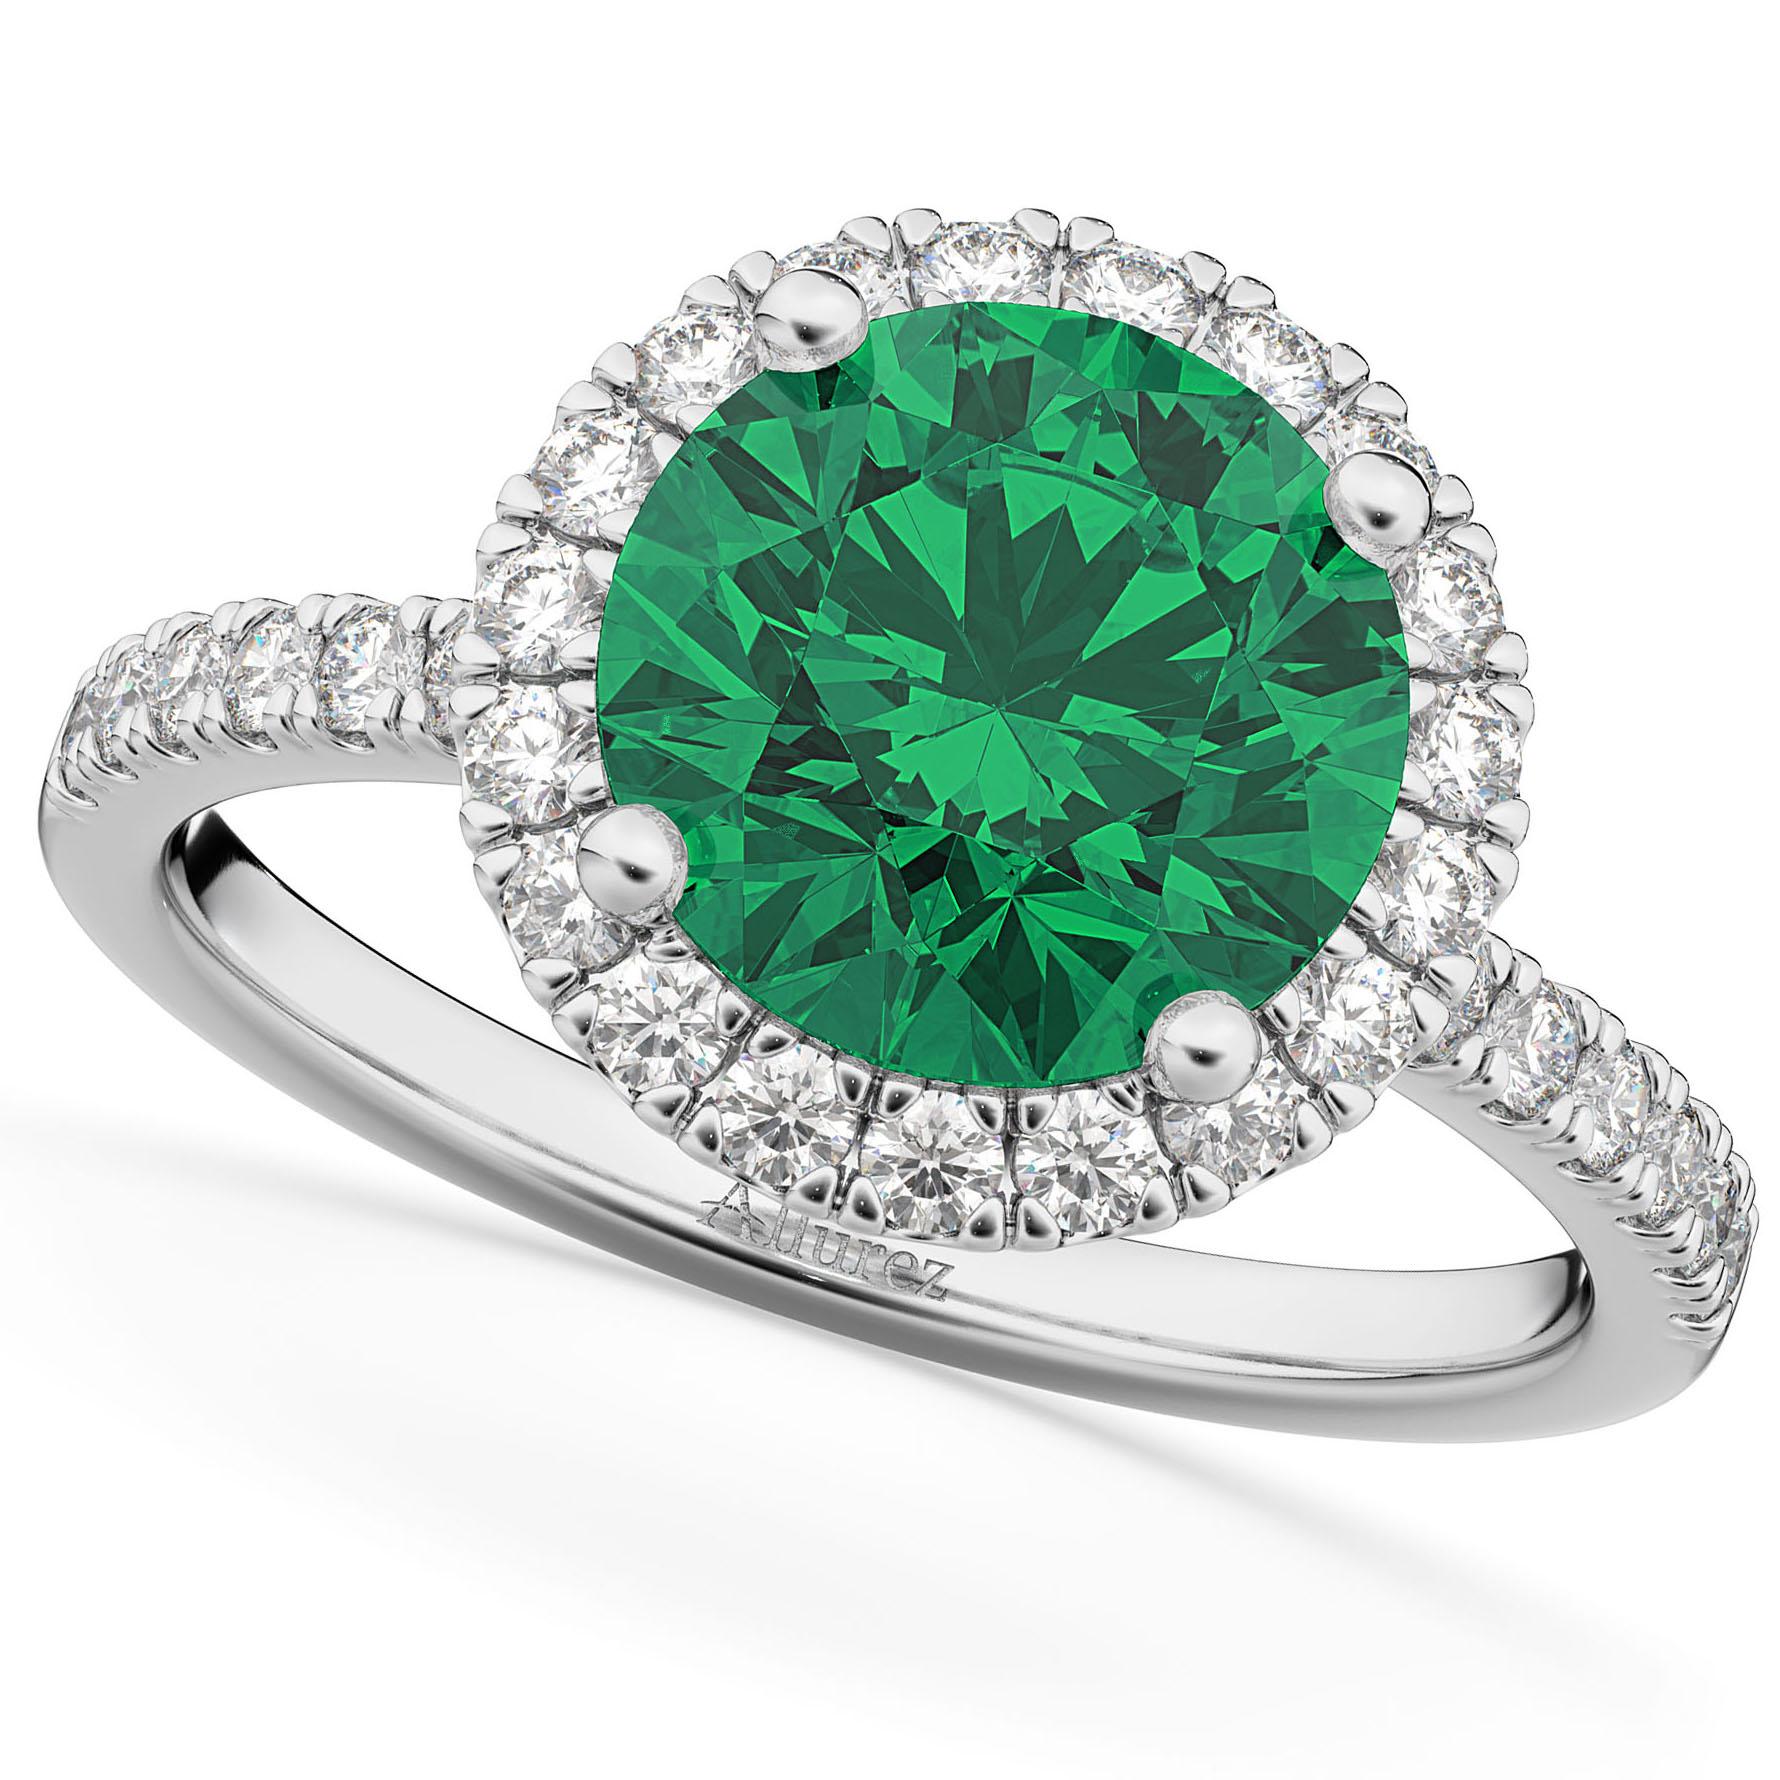 Halo Emerald & Diamond Engagement Ring 14K White Gold 2.80ct